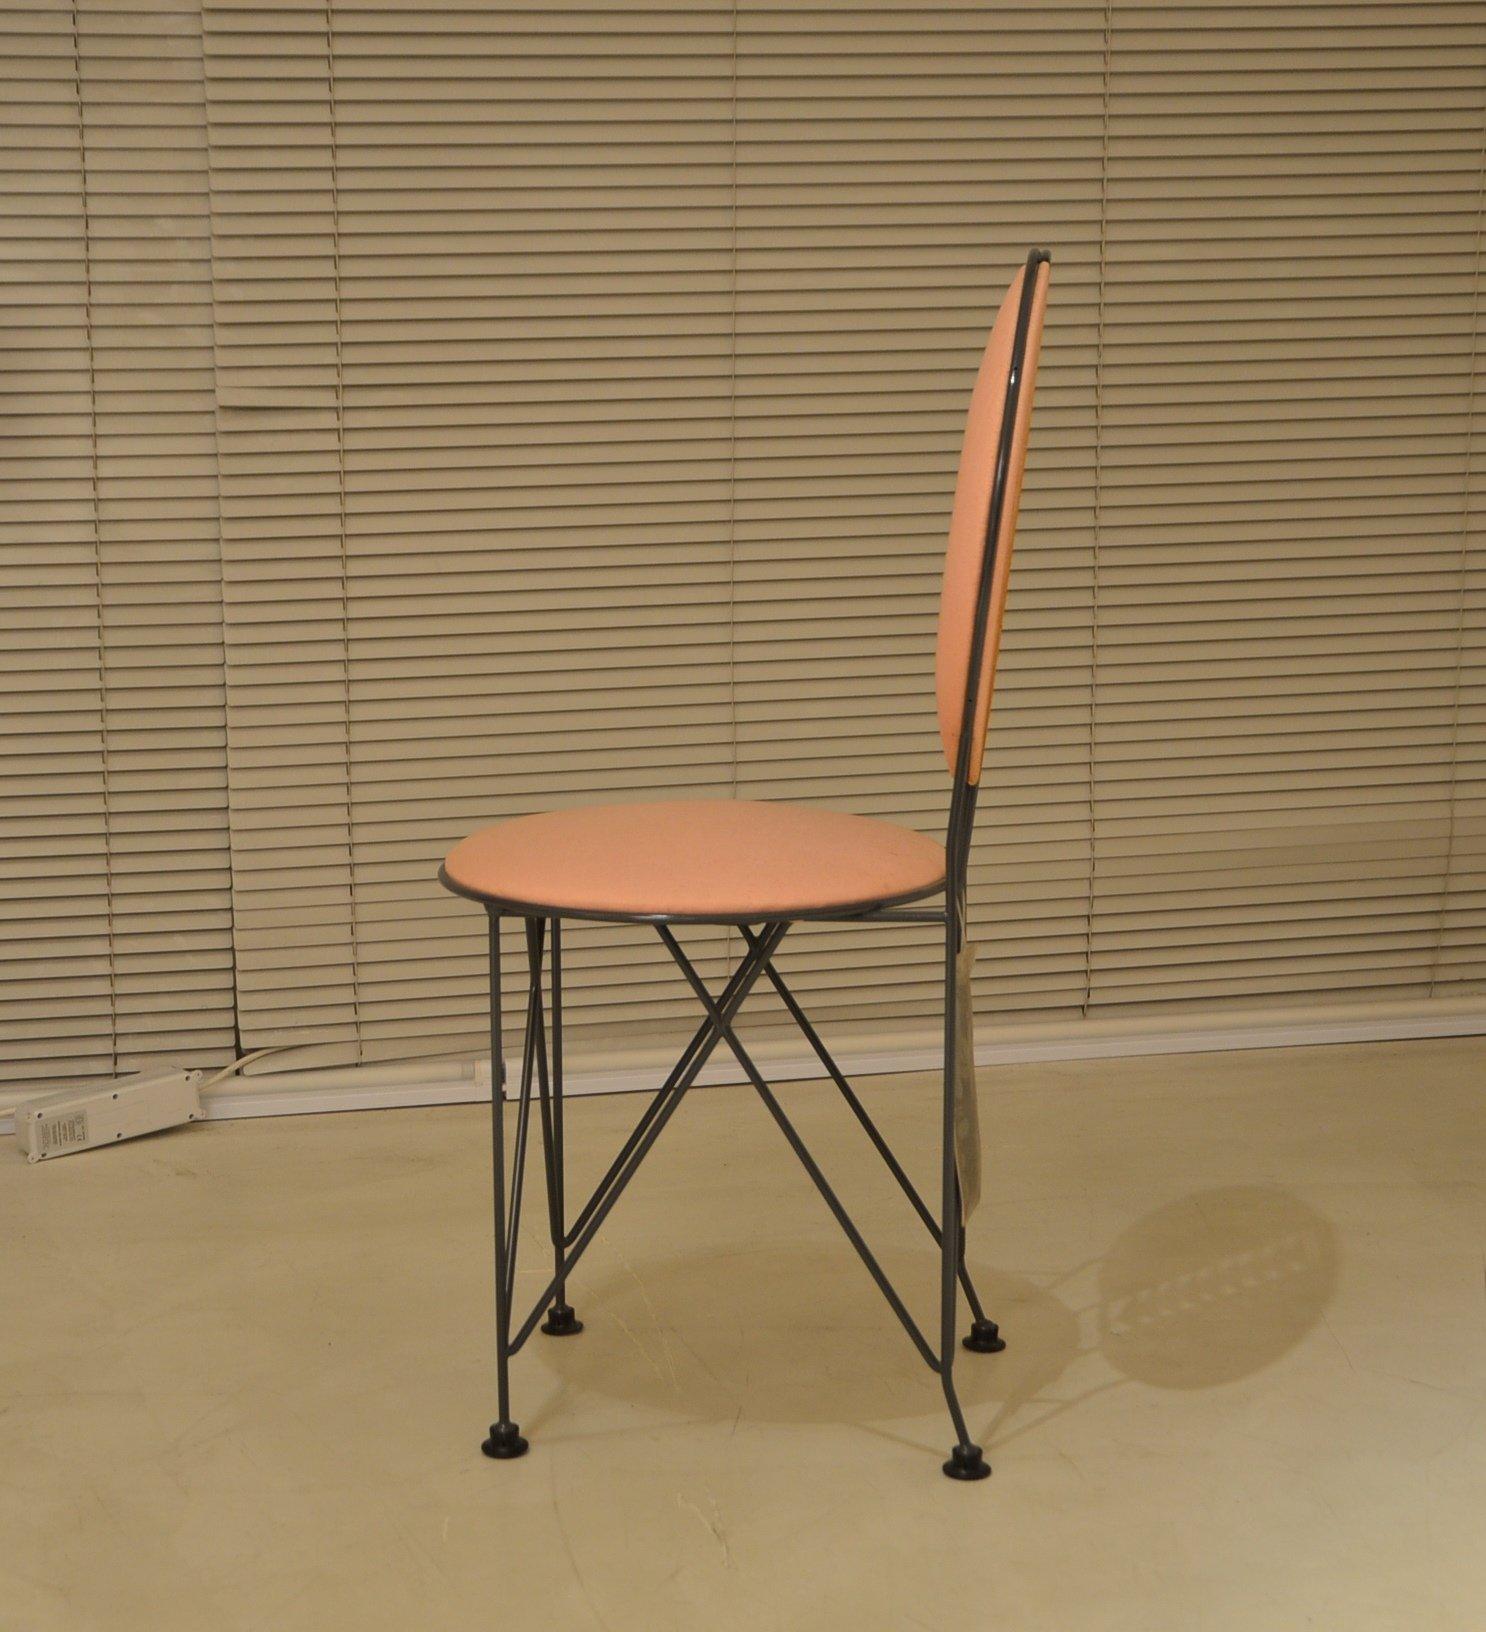 Frank Lloyd Wright Chair Cassina Midway 2 오리지널 디자인 이태리에서 만듦